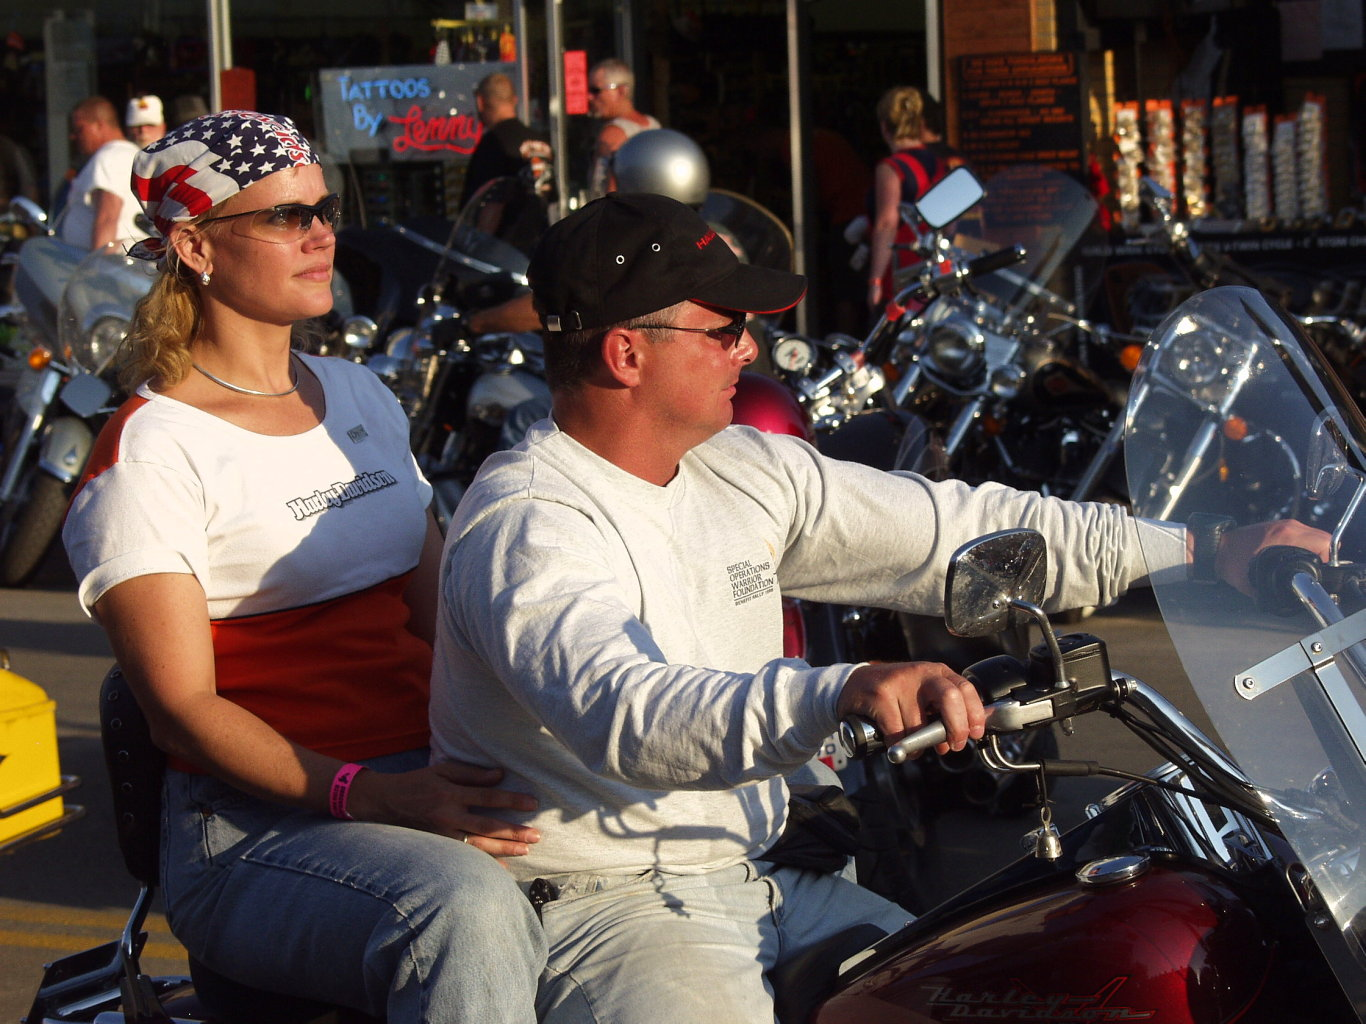 white clad bikers